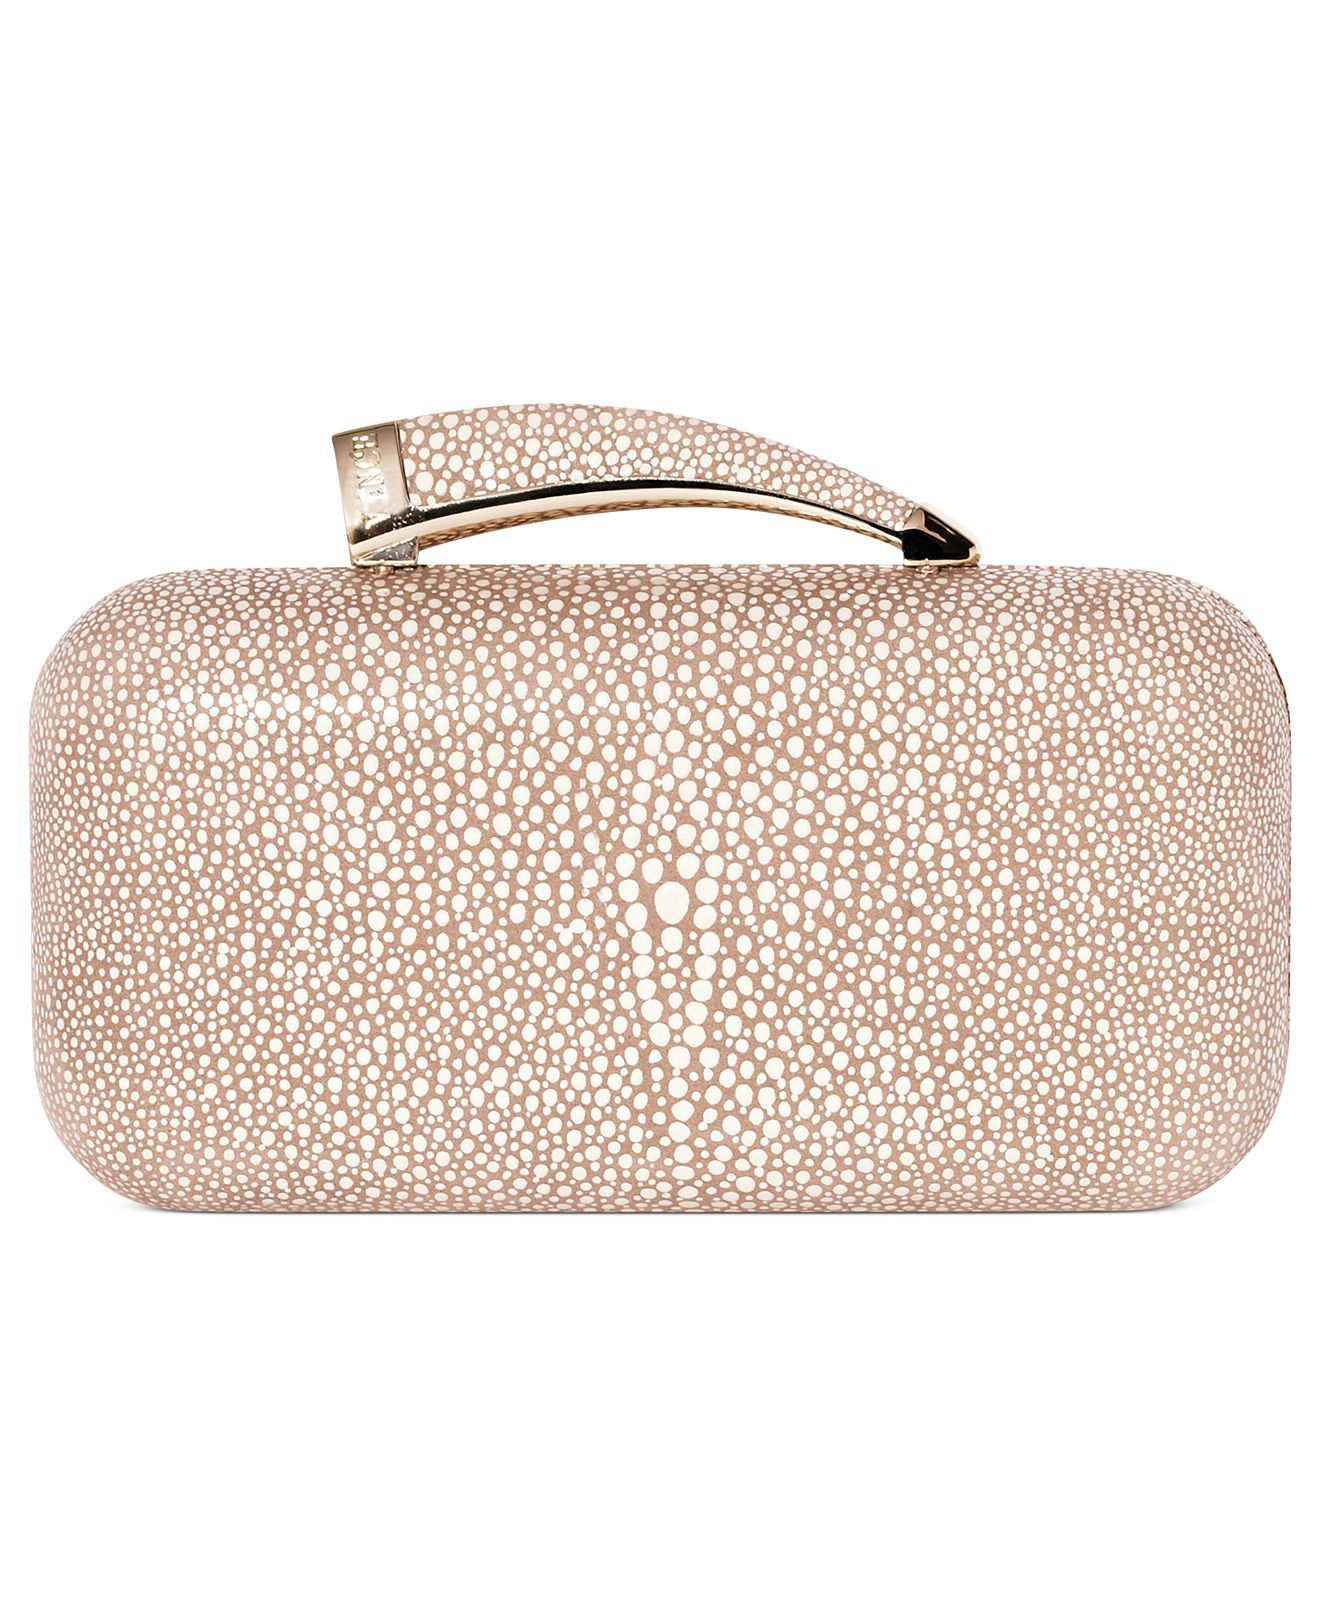 Vince Camuto Handbag, Horn Clutch - Clutches & Evening Bags - Handbags & Accessories - Macy's